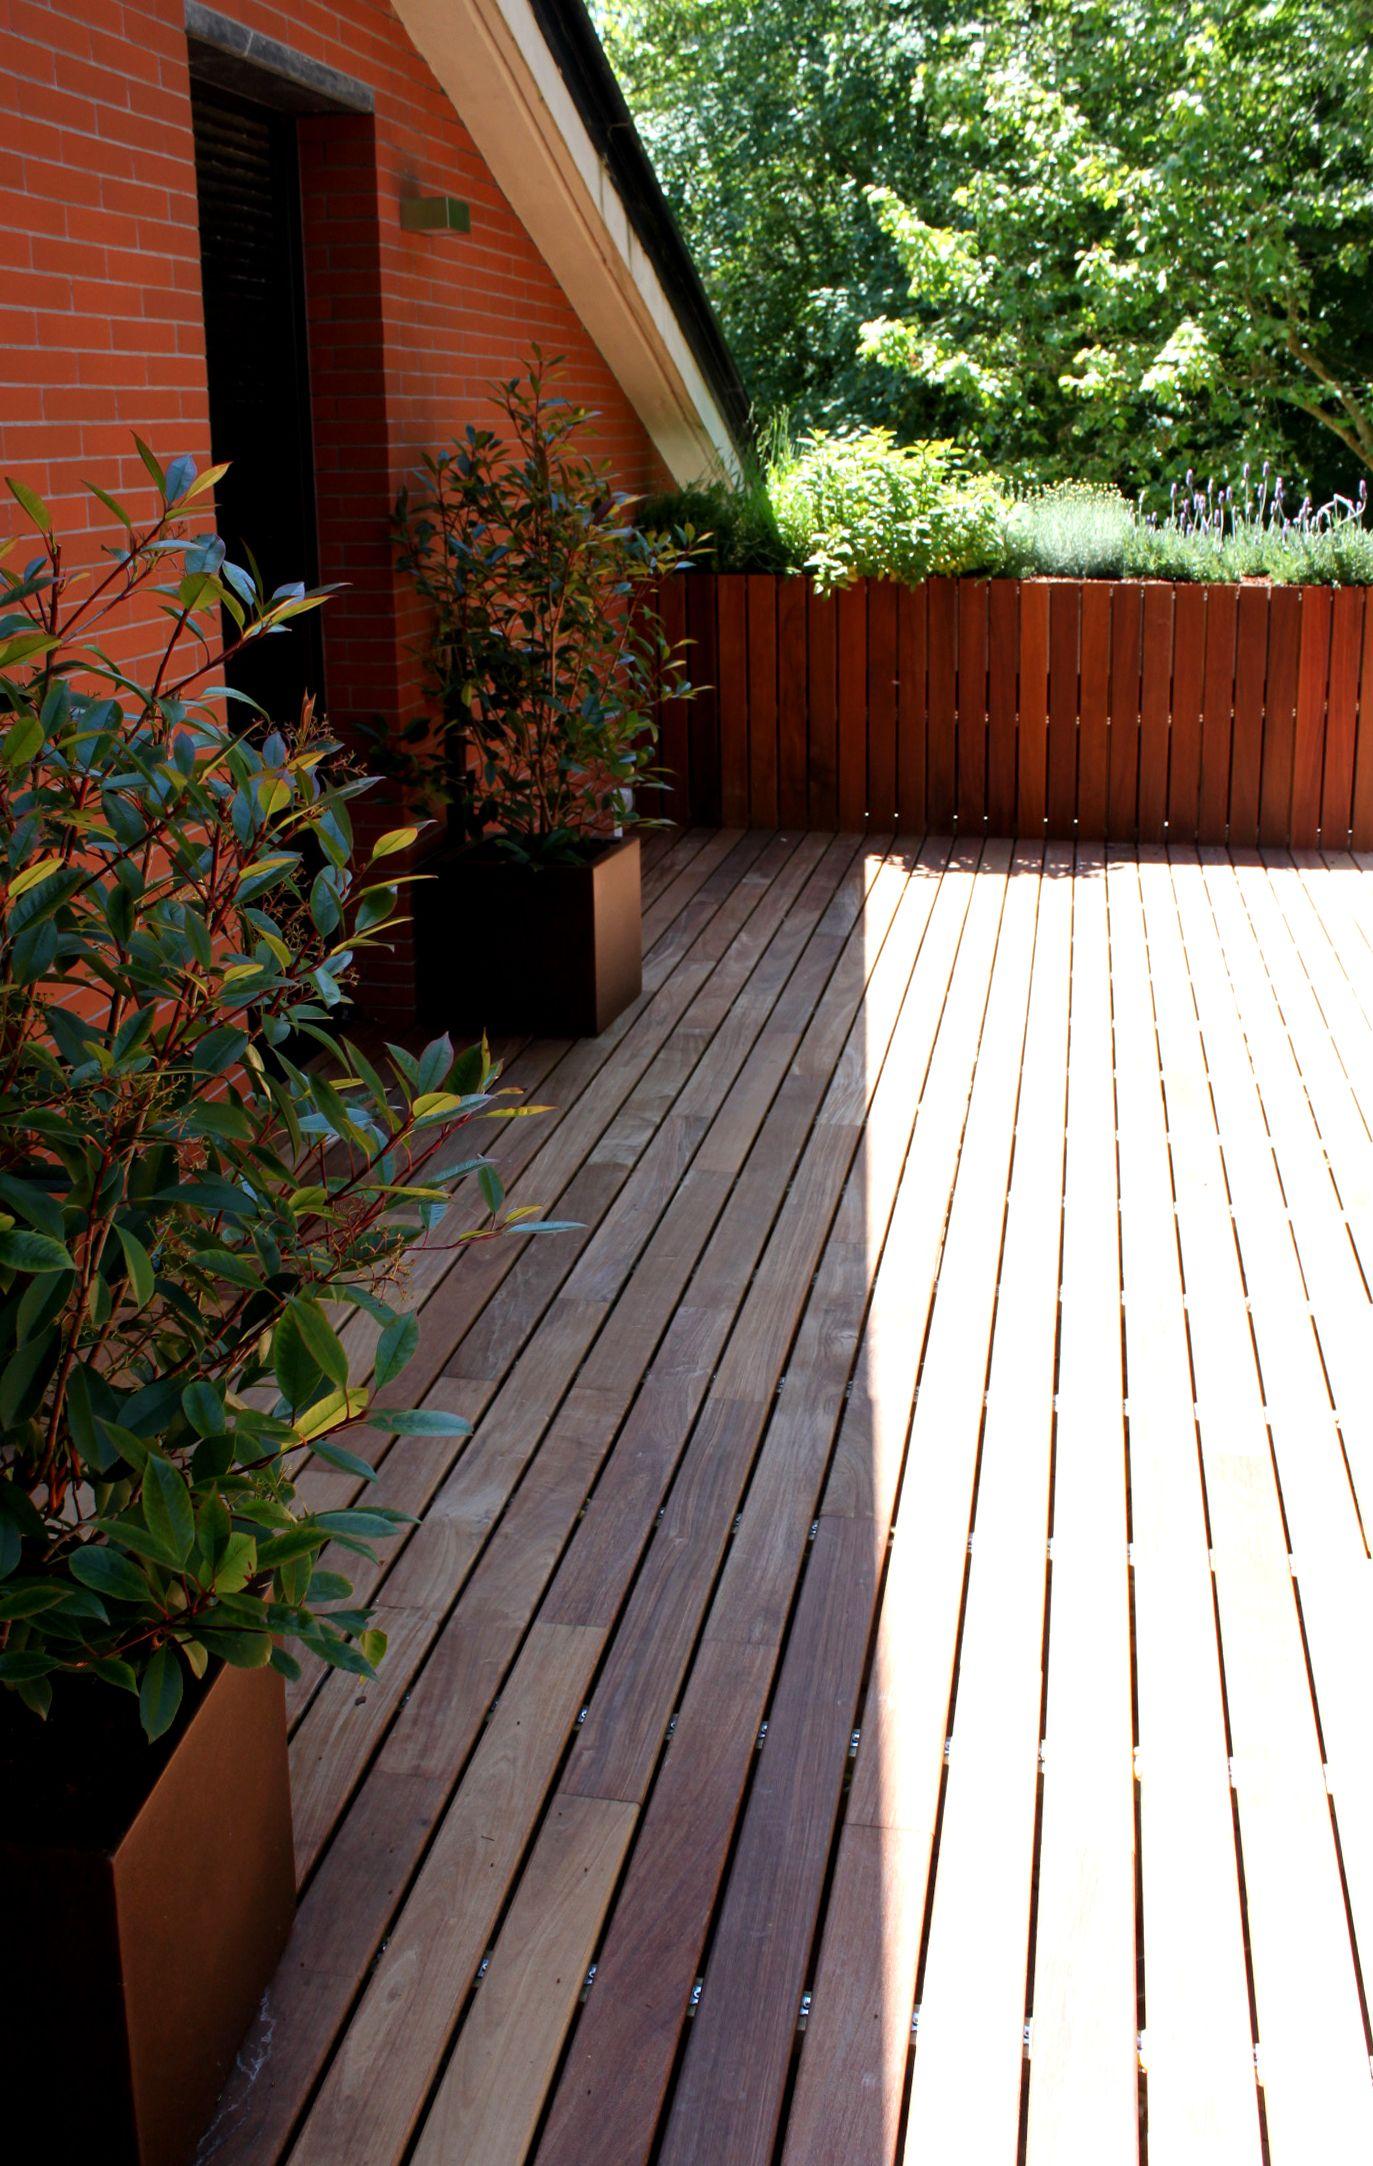 jardin en atico diseo paisajismo jardines terrazas